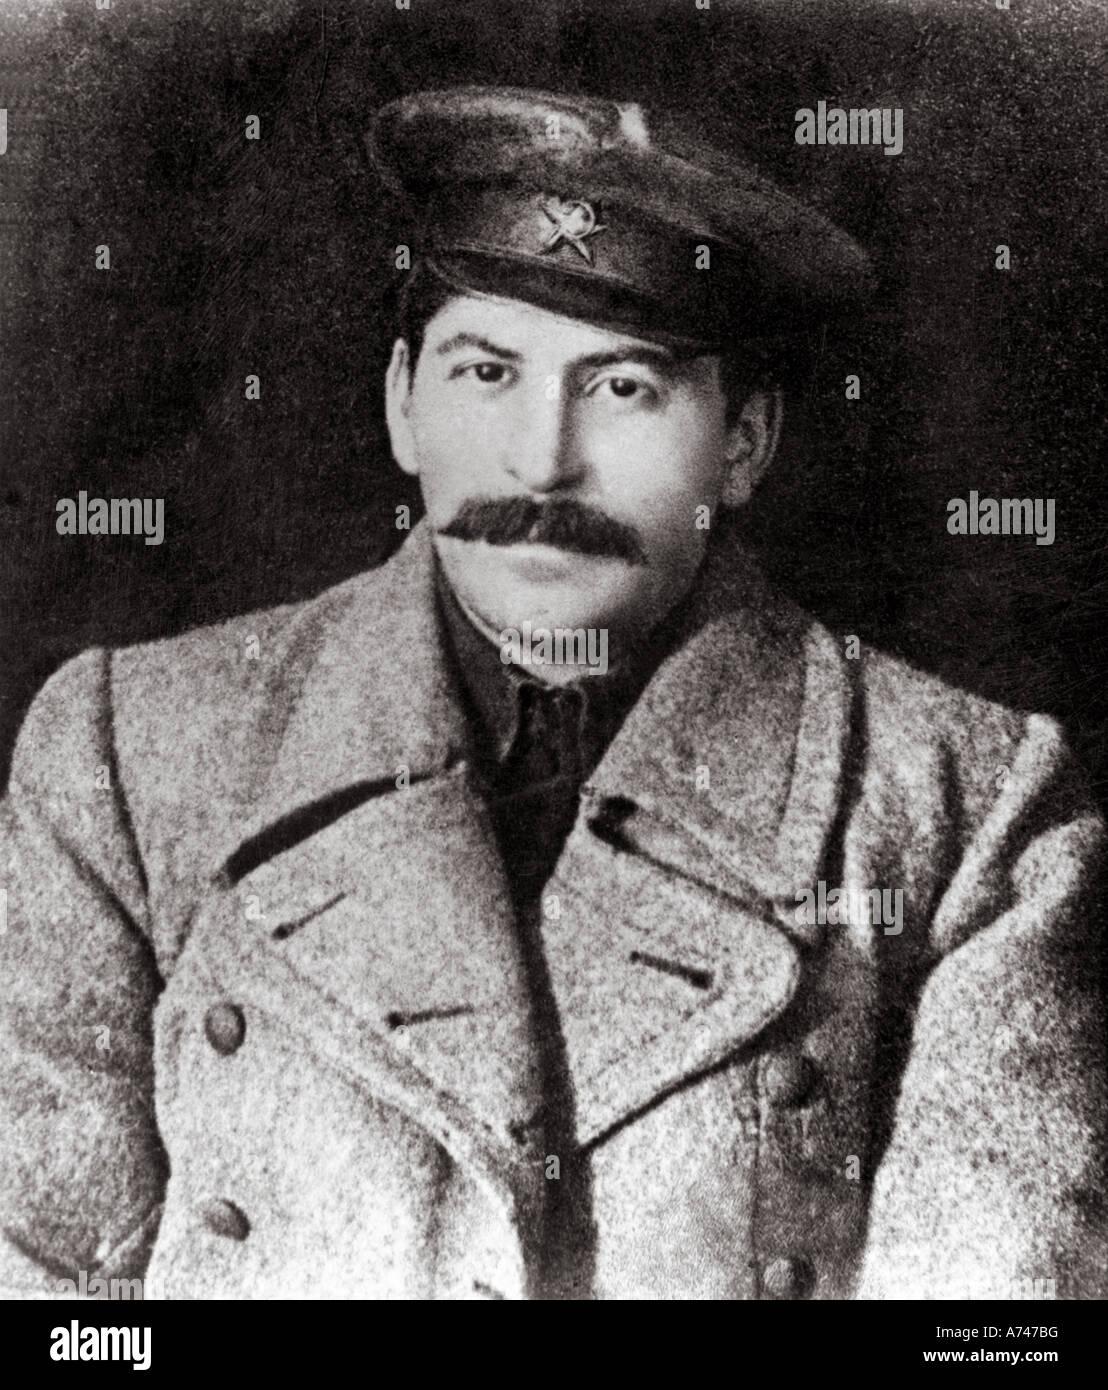 JOSEPH STALIN about 1926 - Stock Image